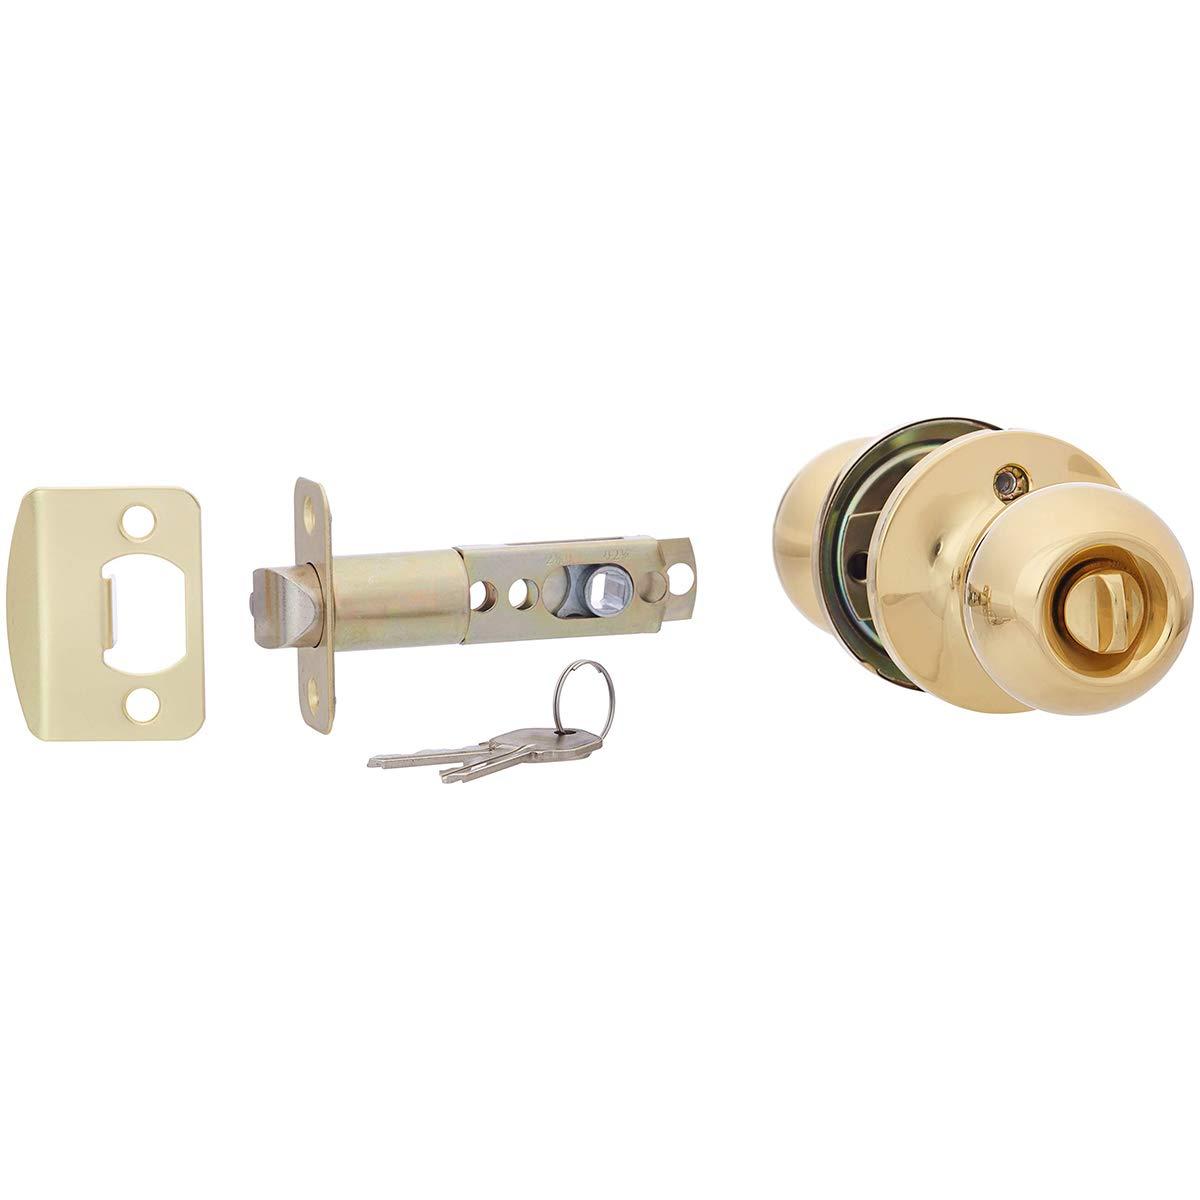 AmazonBasics Entry Door Knob - Standard Ball - Polished Brass by AmazonBasics (Image #3)